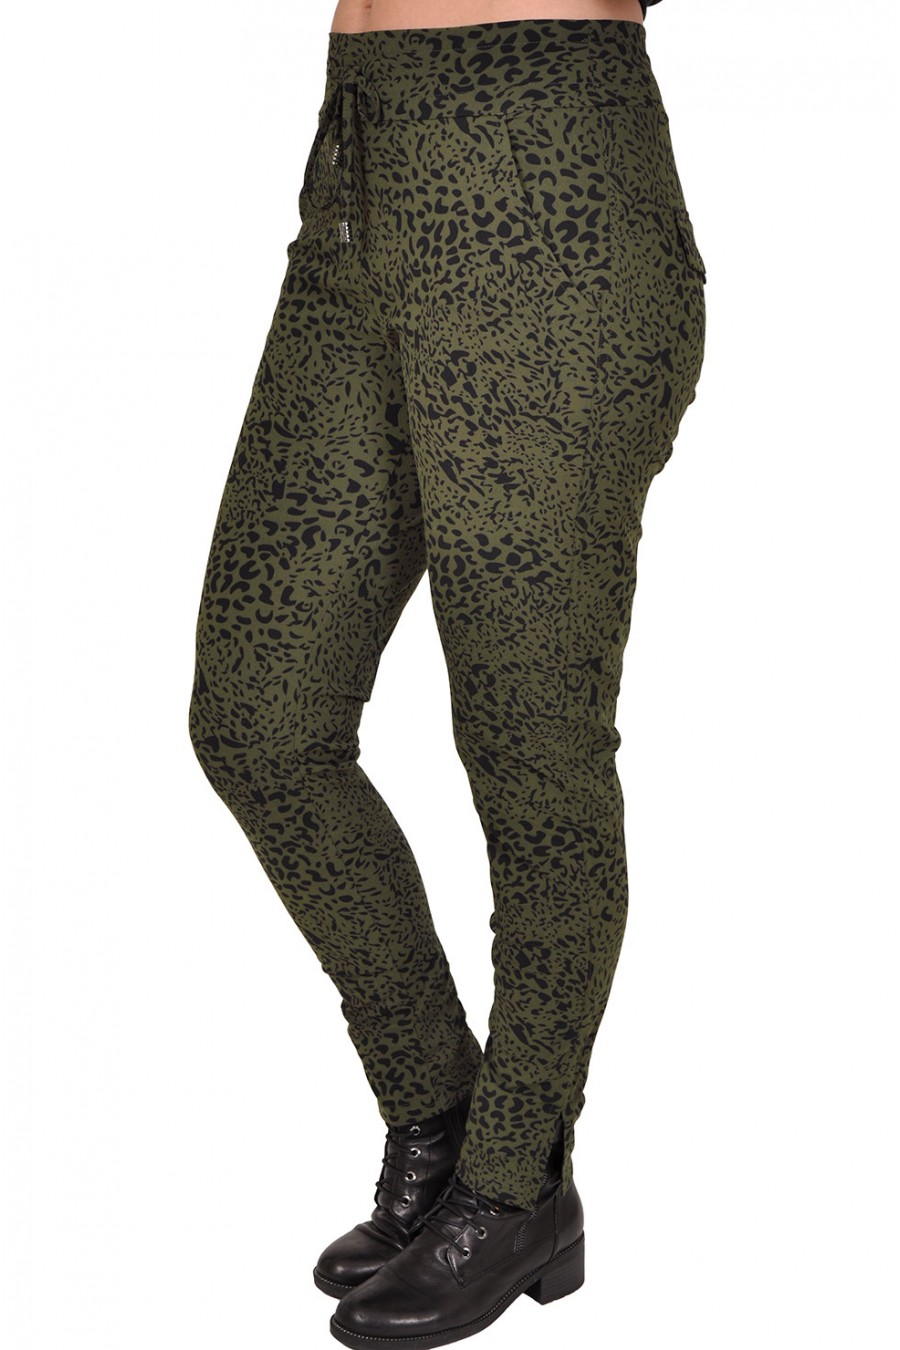 Travelstof broek army leopard Daelin Daelin